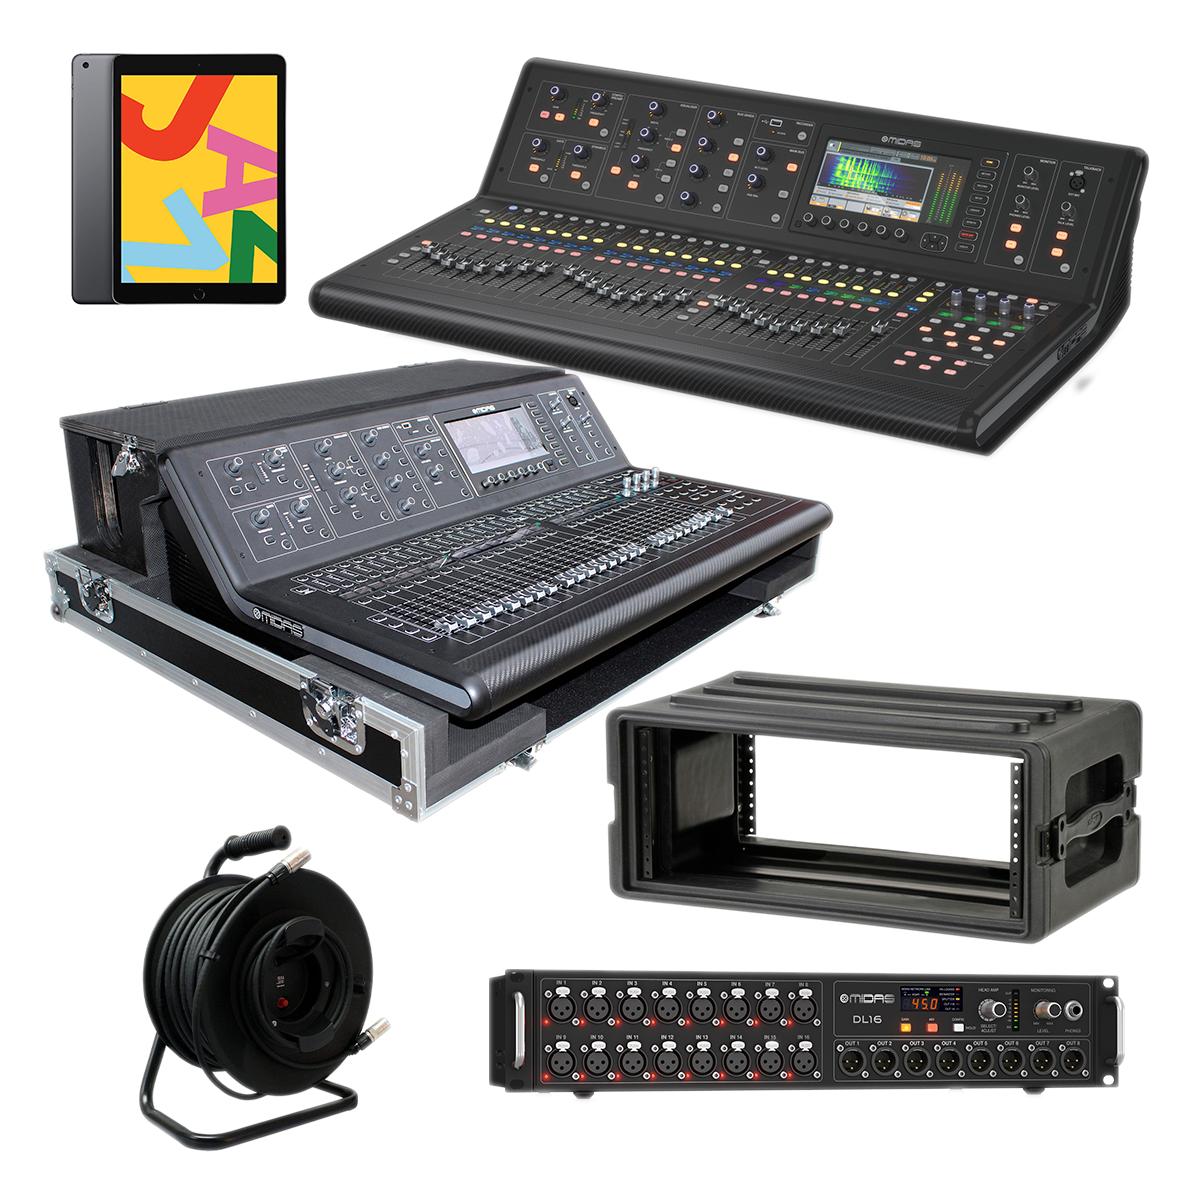 - 9 Midas M32 LIVE - ProX XS-MIDM32DHW - DL16 - Proco Cat6e 150Ft - Apple iPad - SKB 1SKB-R4S - $6399.99